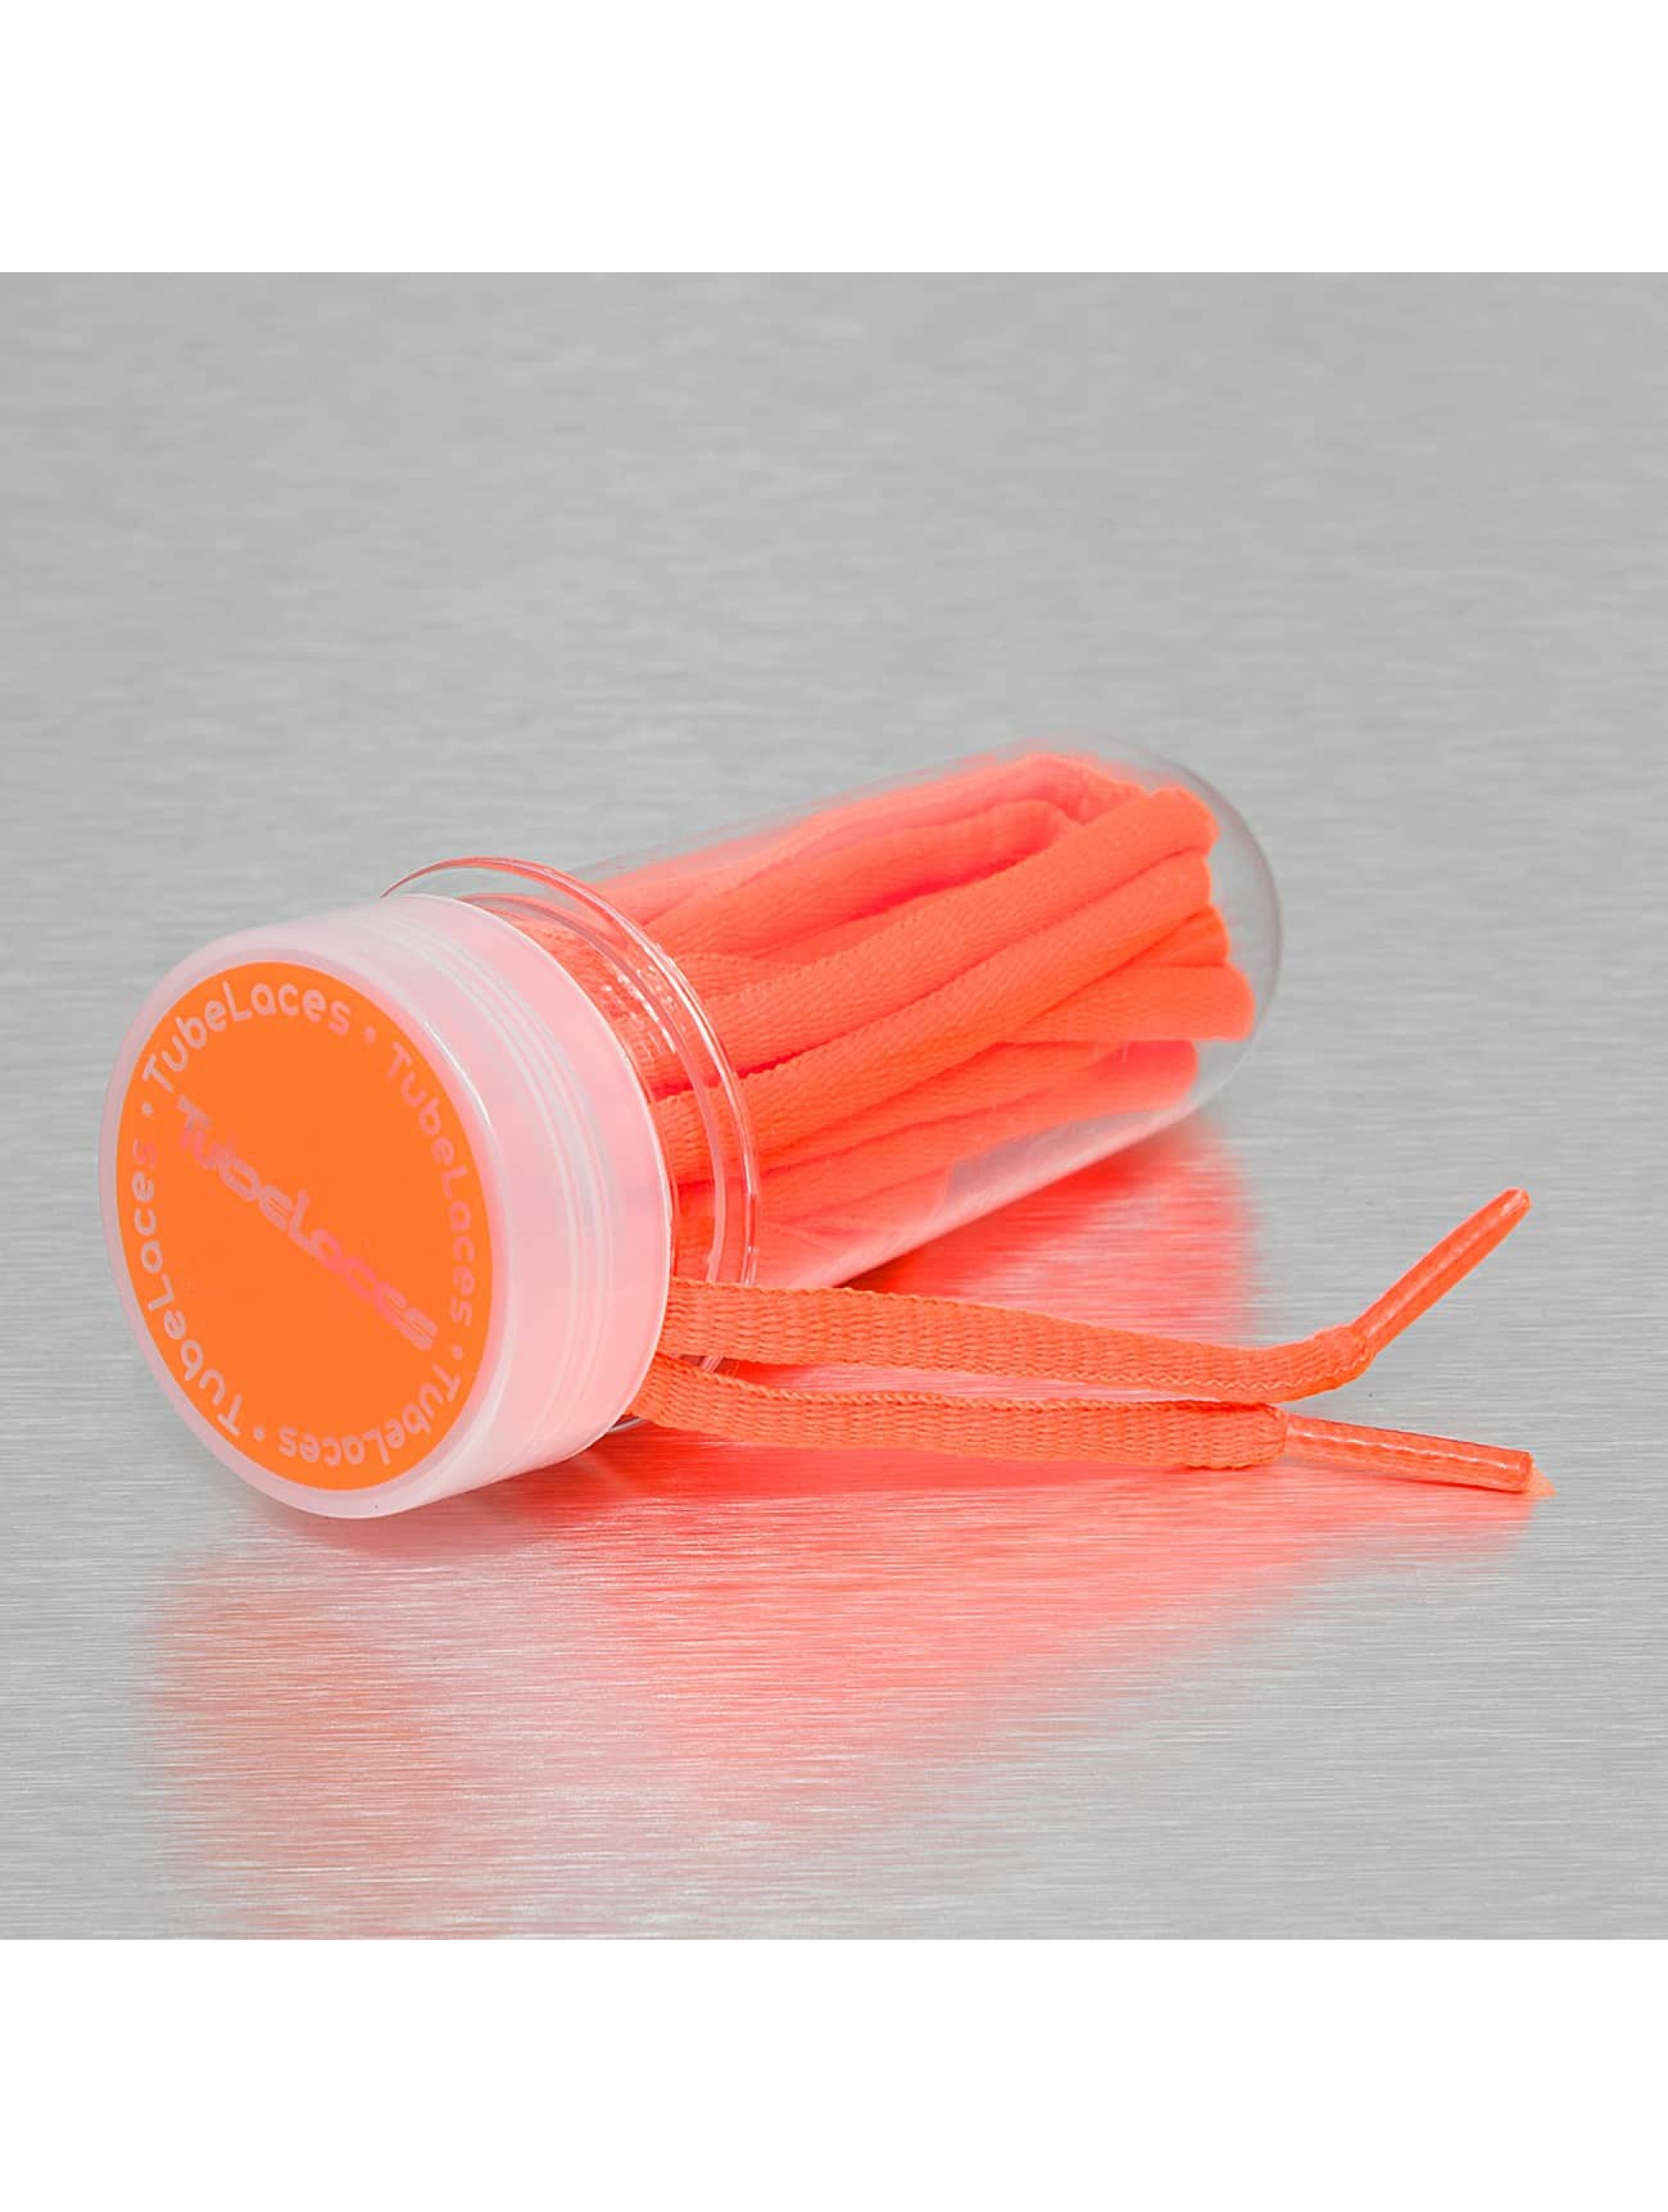 Tubelaces Аксессуар для обуви Pad Laces 130cm оранжевый